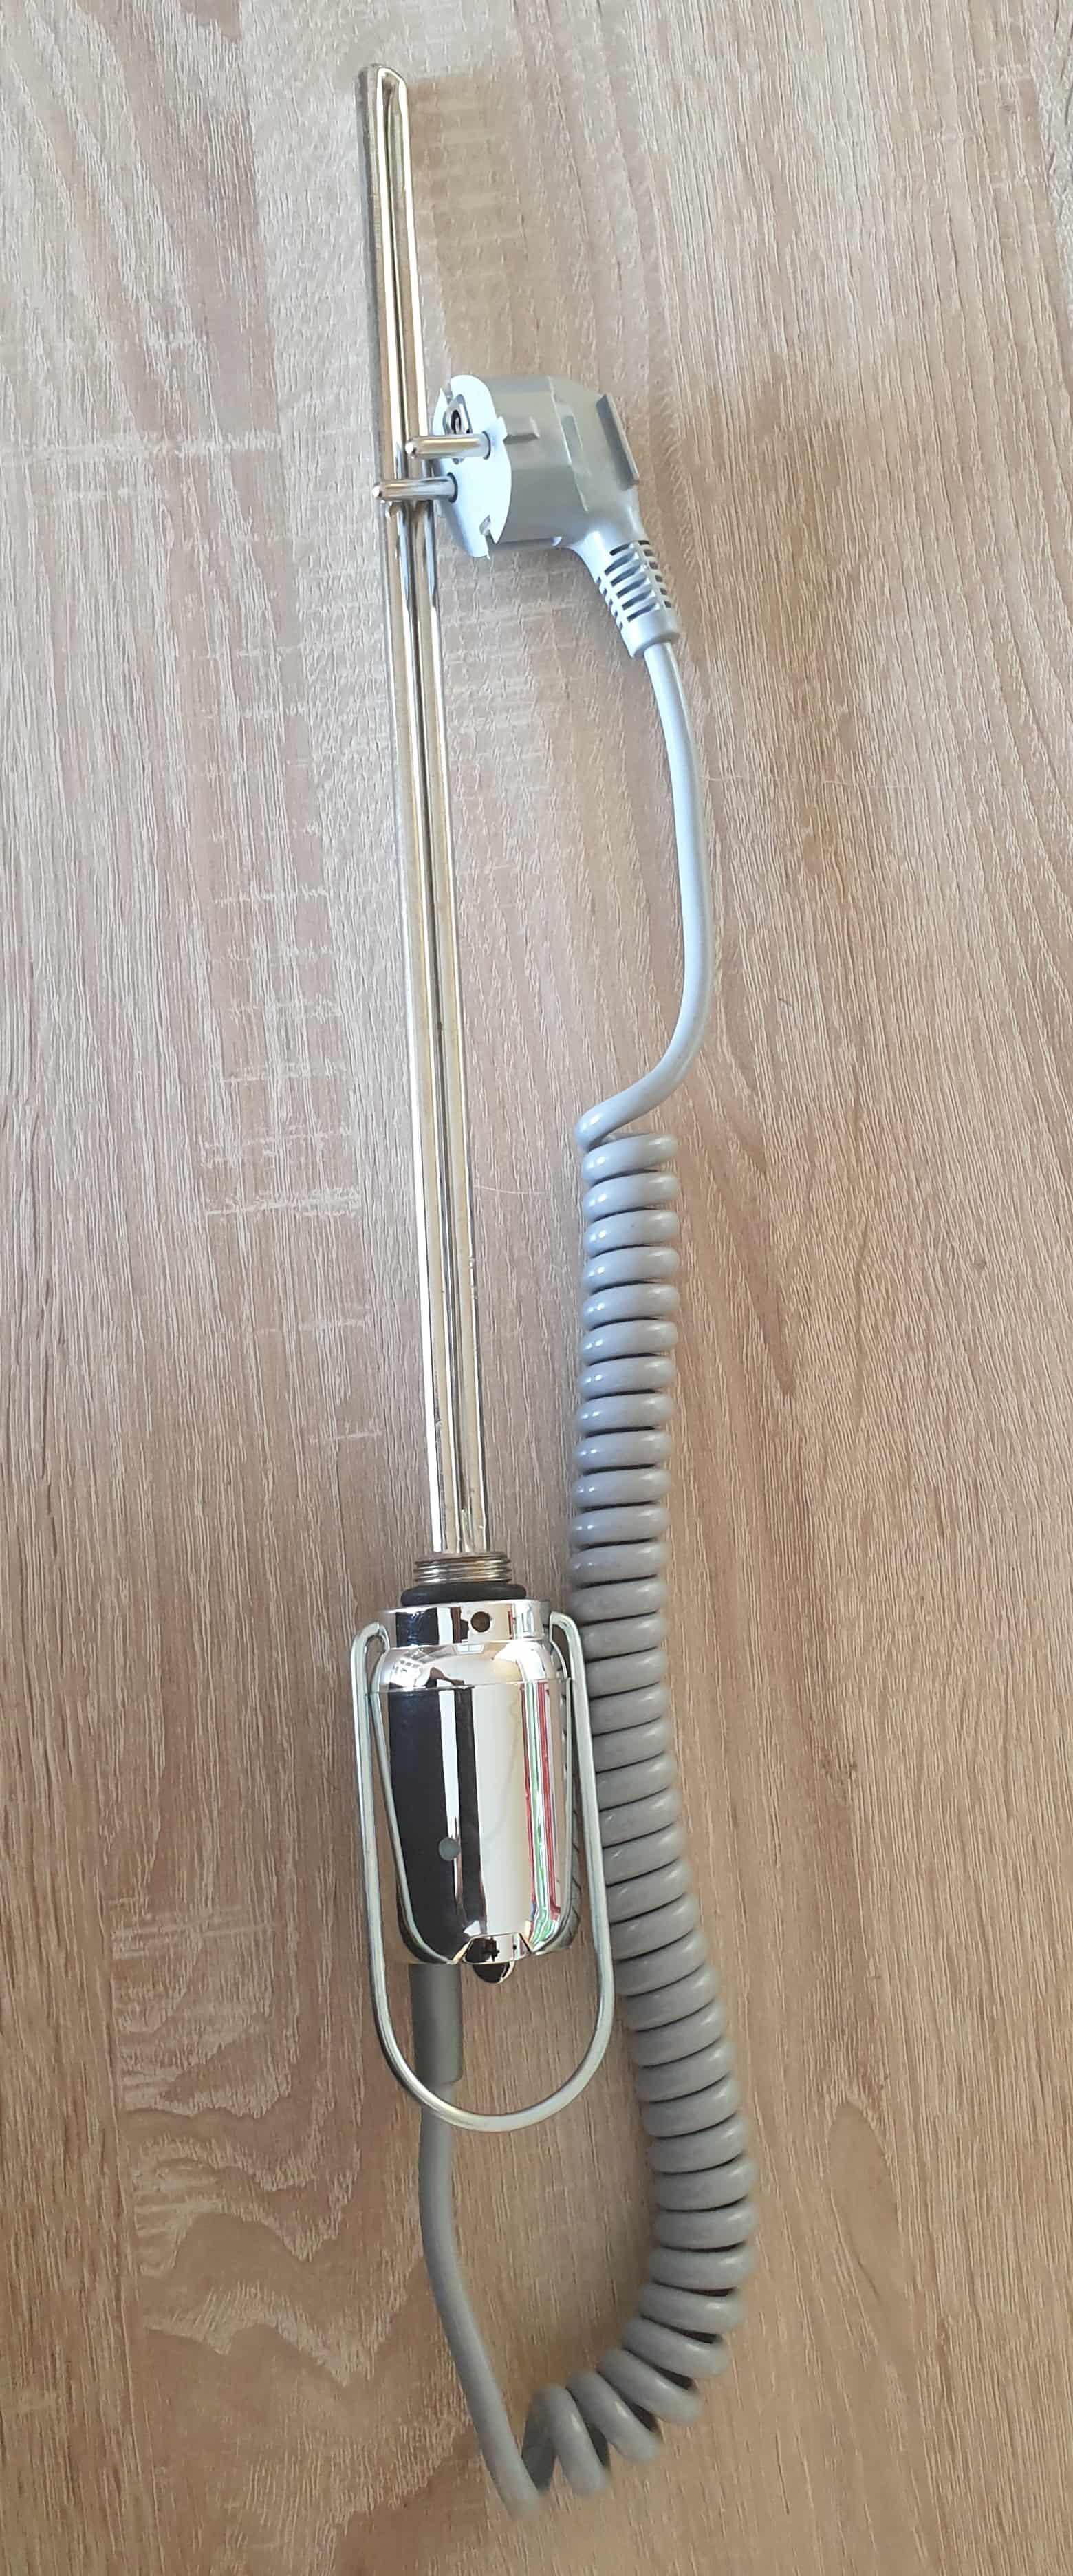 Нагреватели за радиатори лири Thermostyle хром